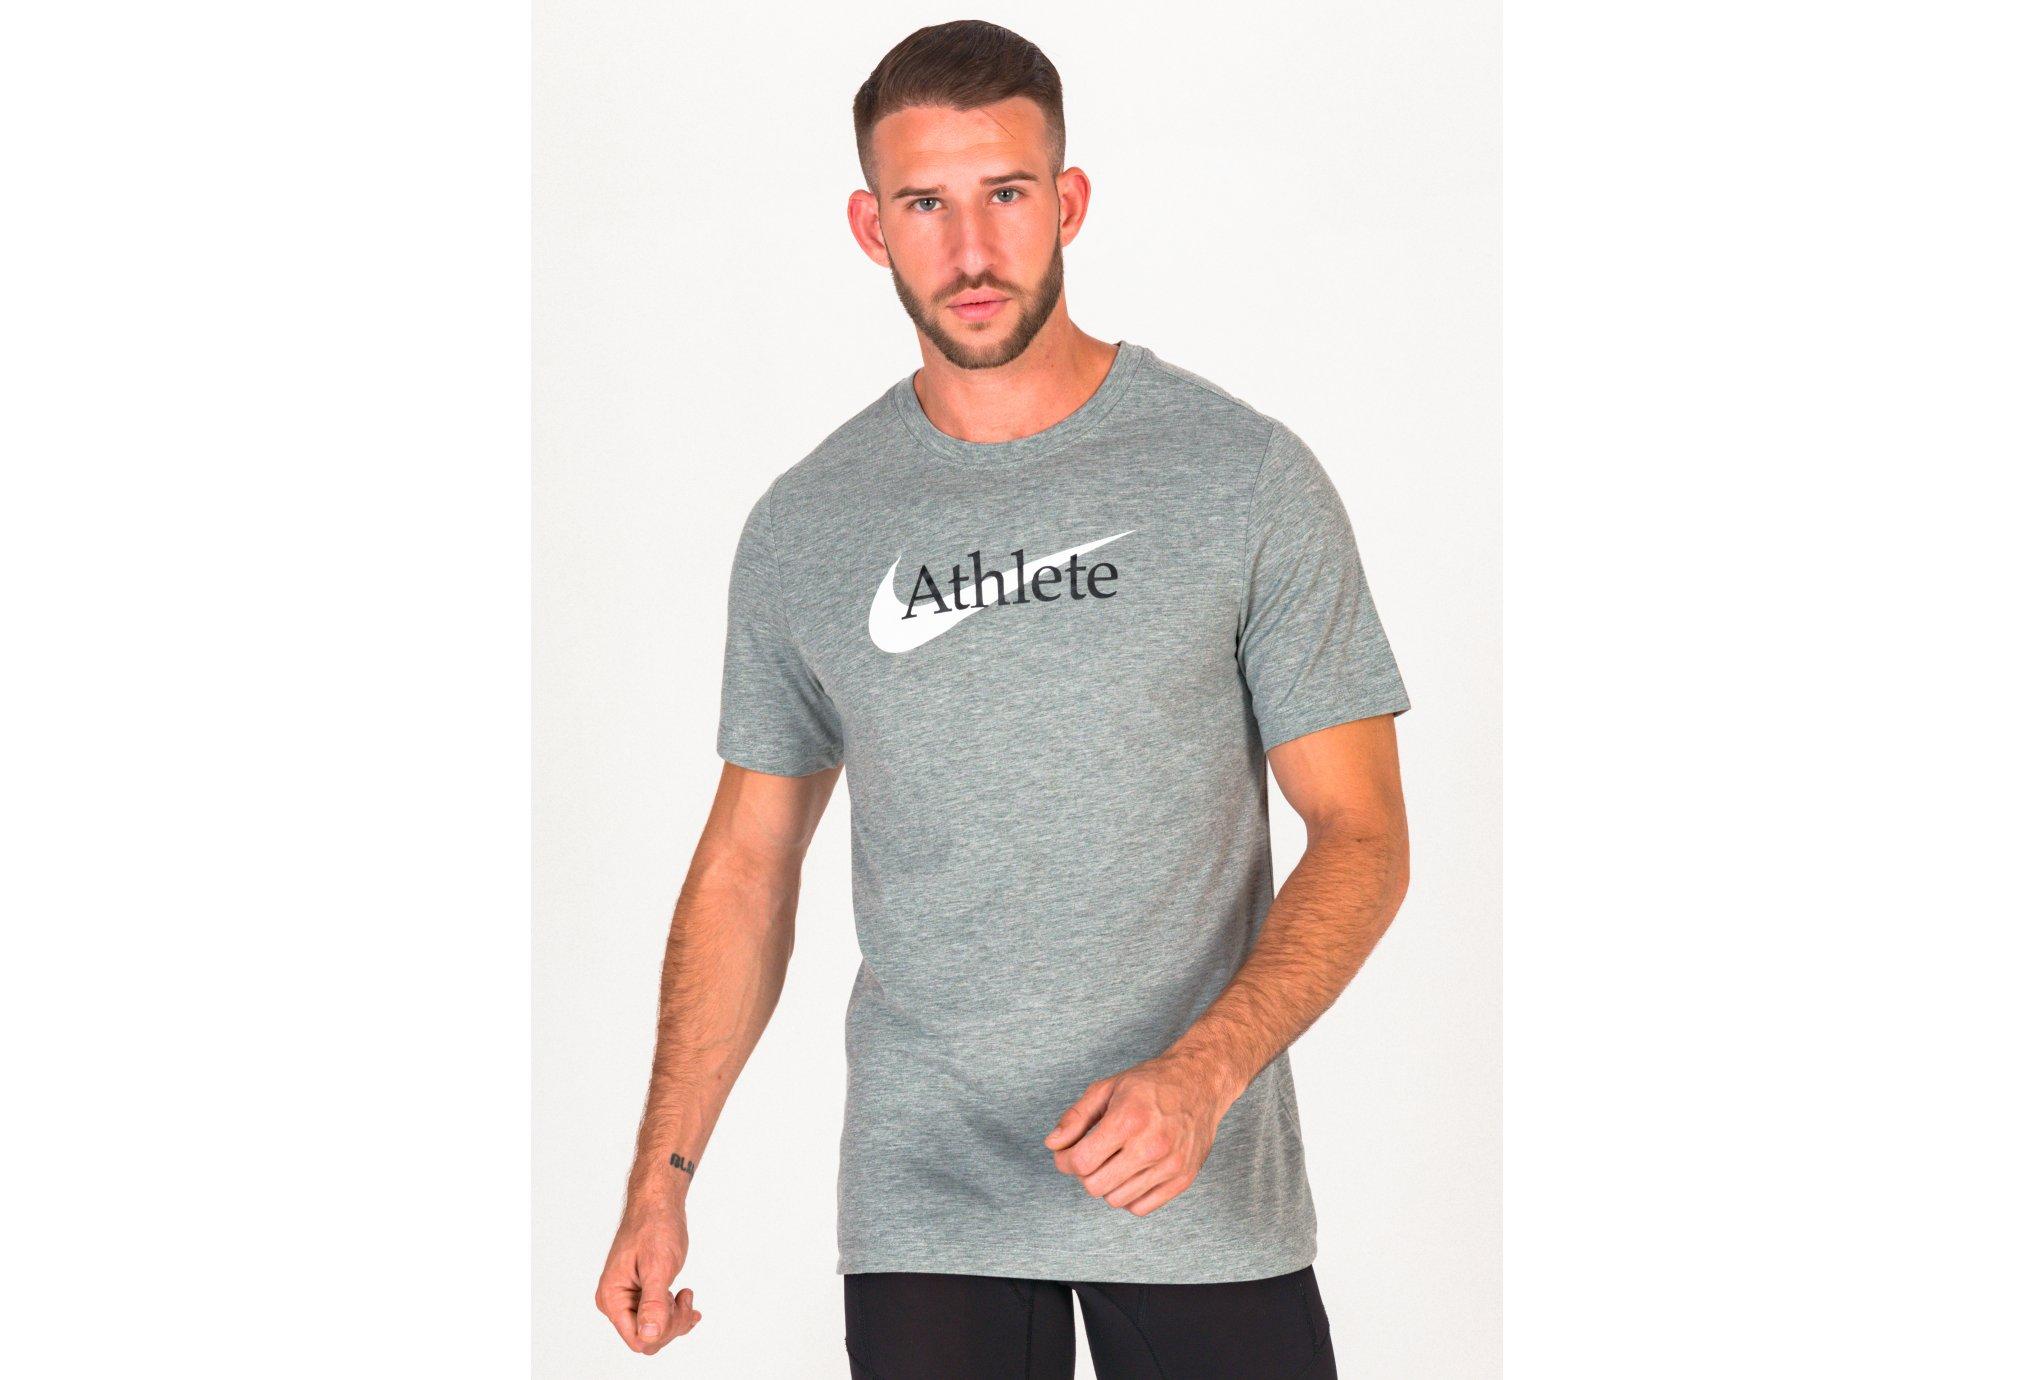 Nike Swoosh Athlete M vêtement running homme